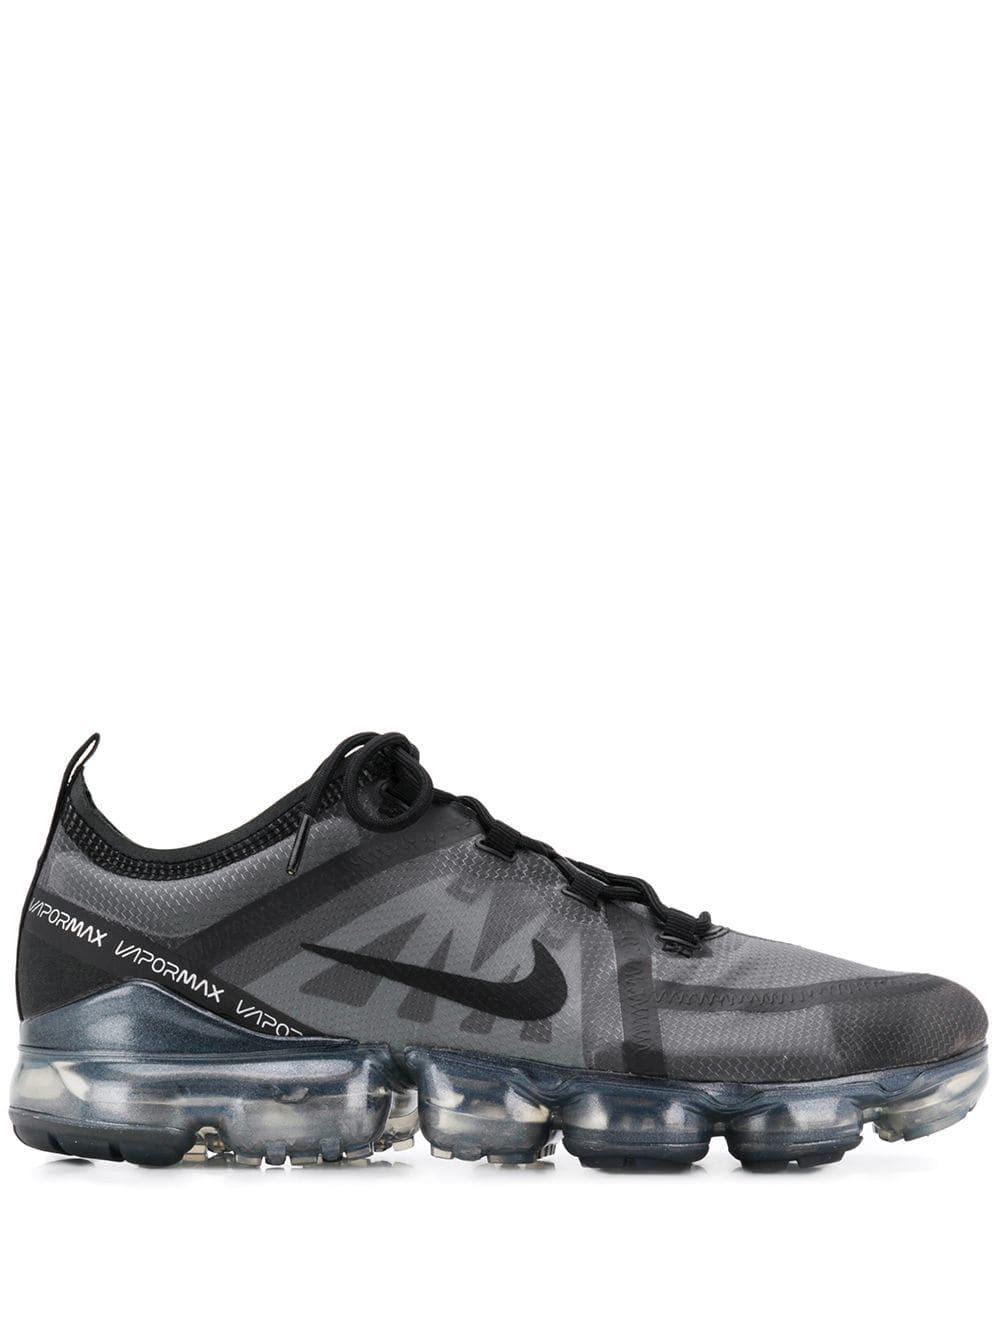 8cdf187eba94b3 Nike Vapormax 2019 Sneakers - Green. Farfetch